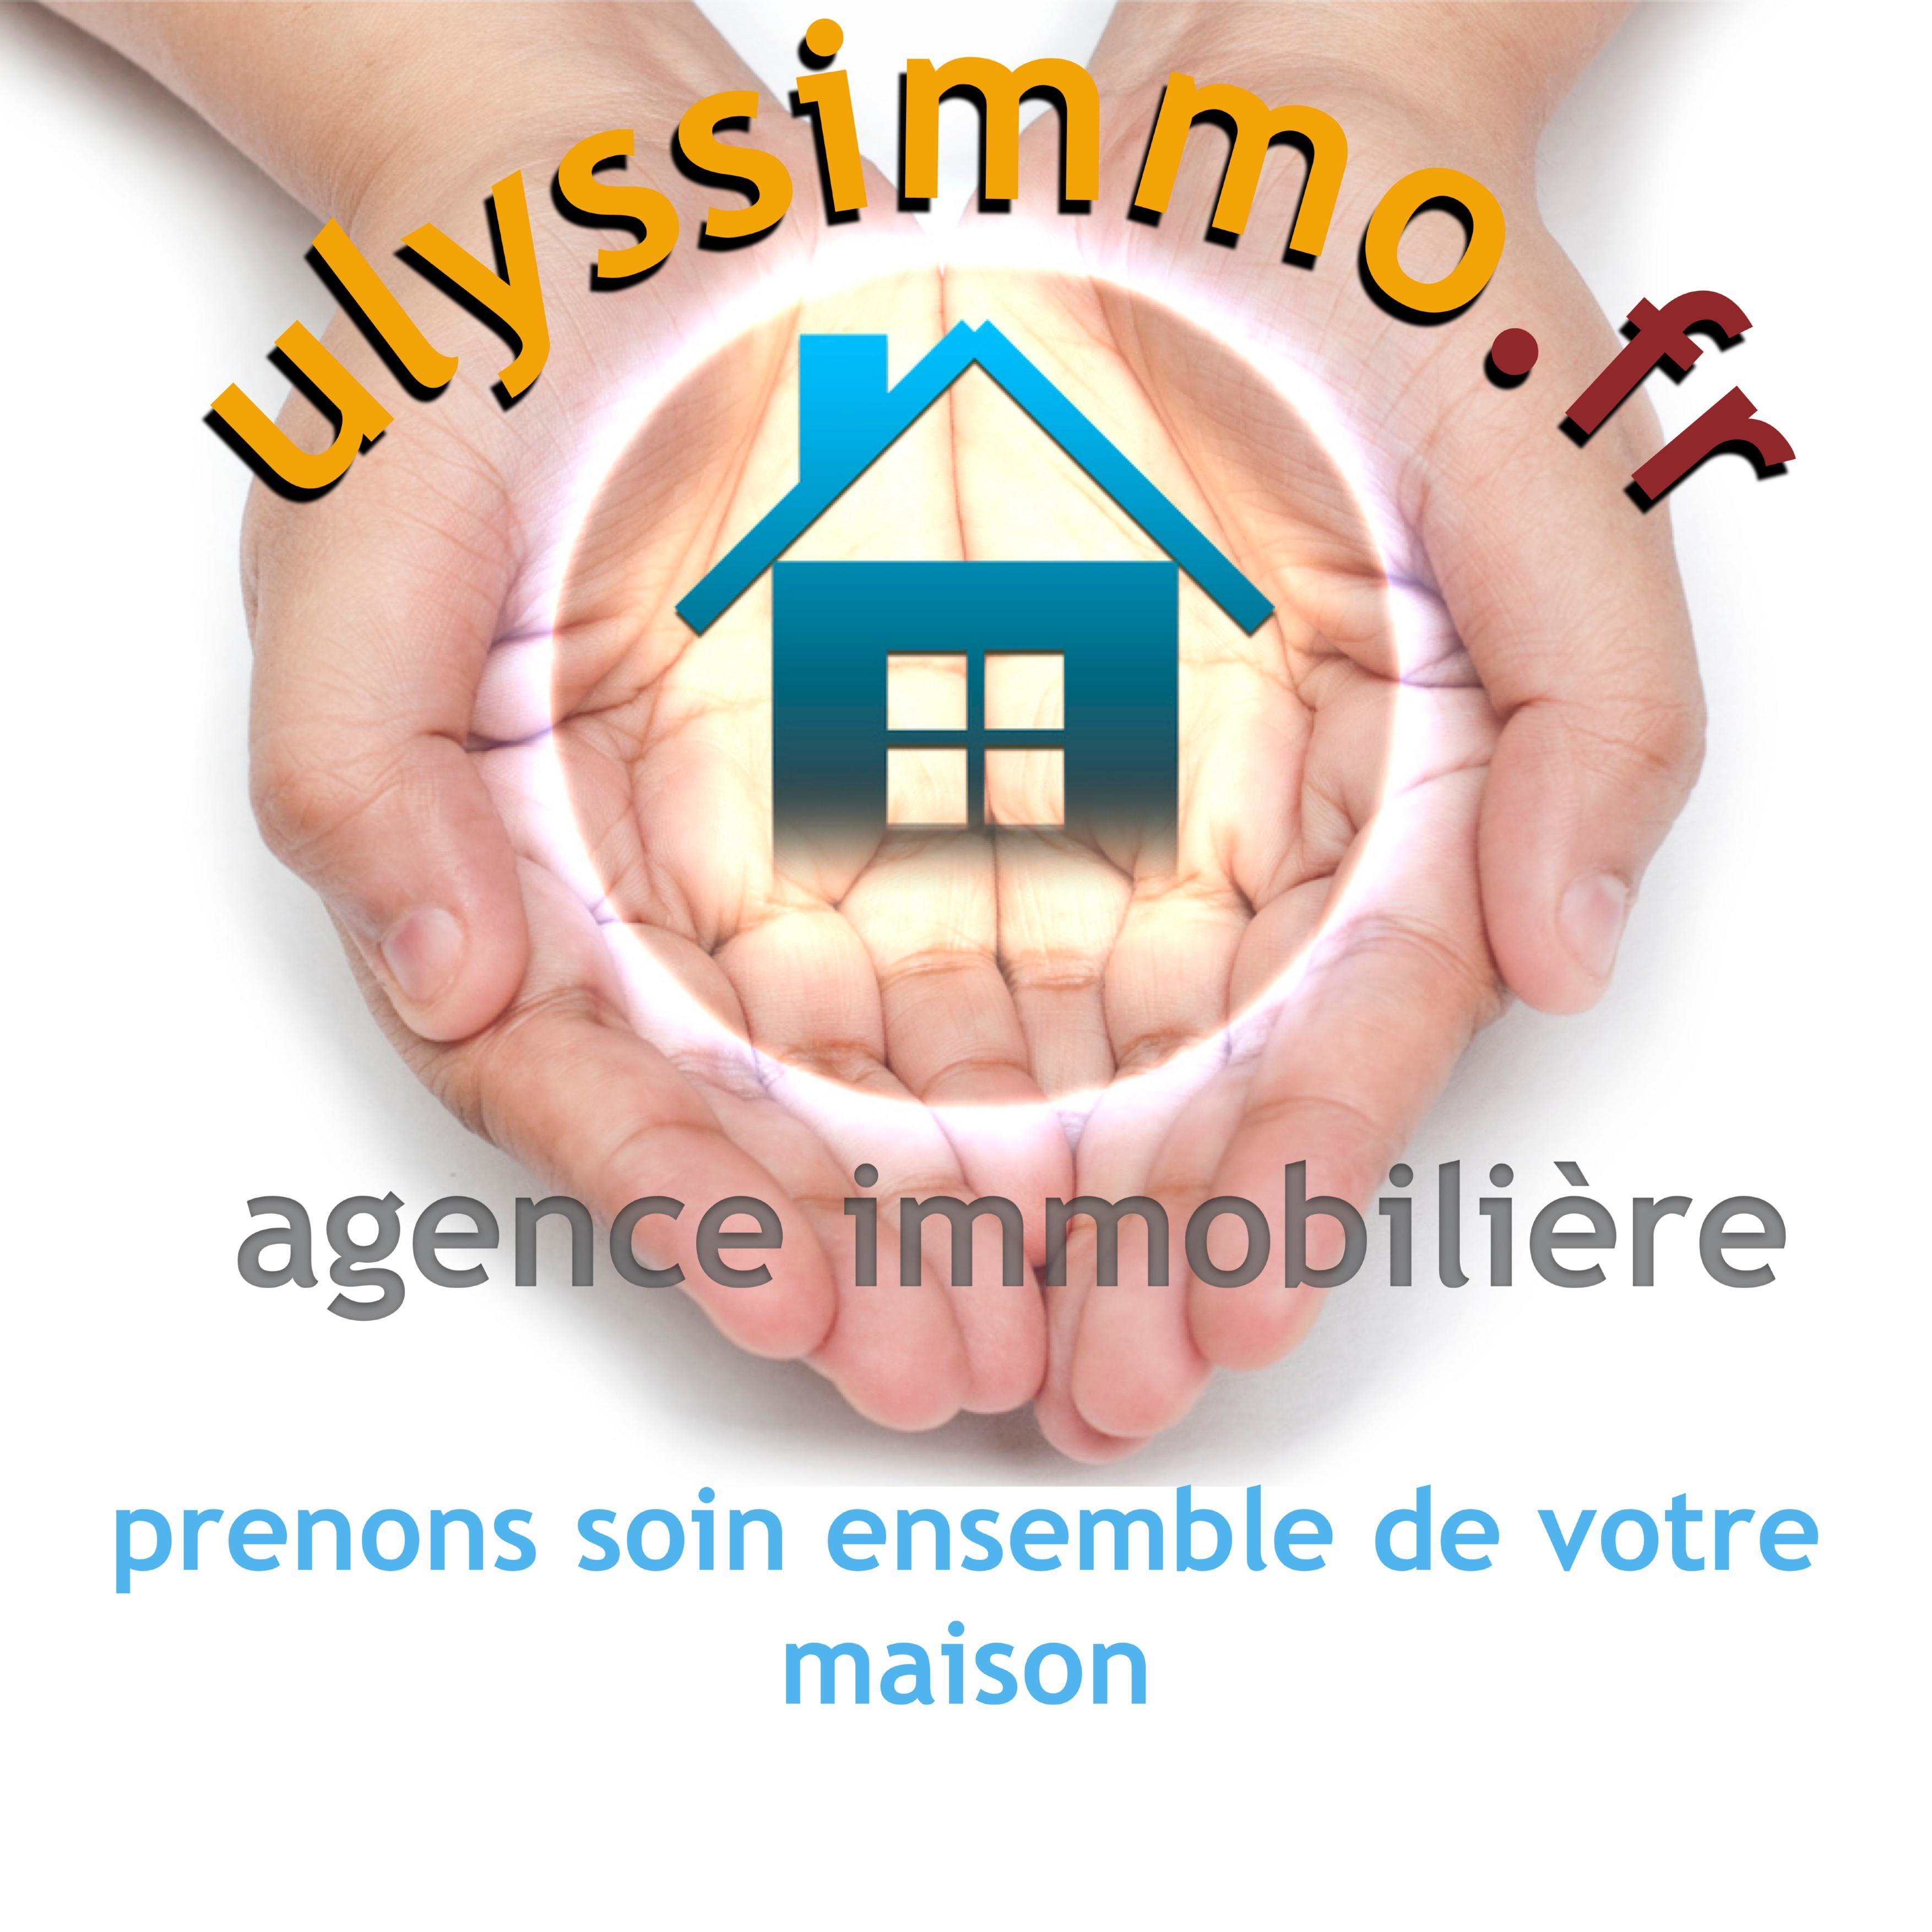 Ulyssimmo.Fr agence immobilière Rosieres en Santerre 80170